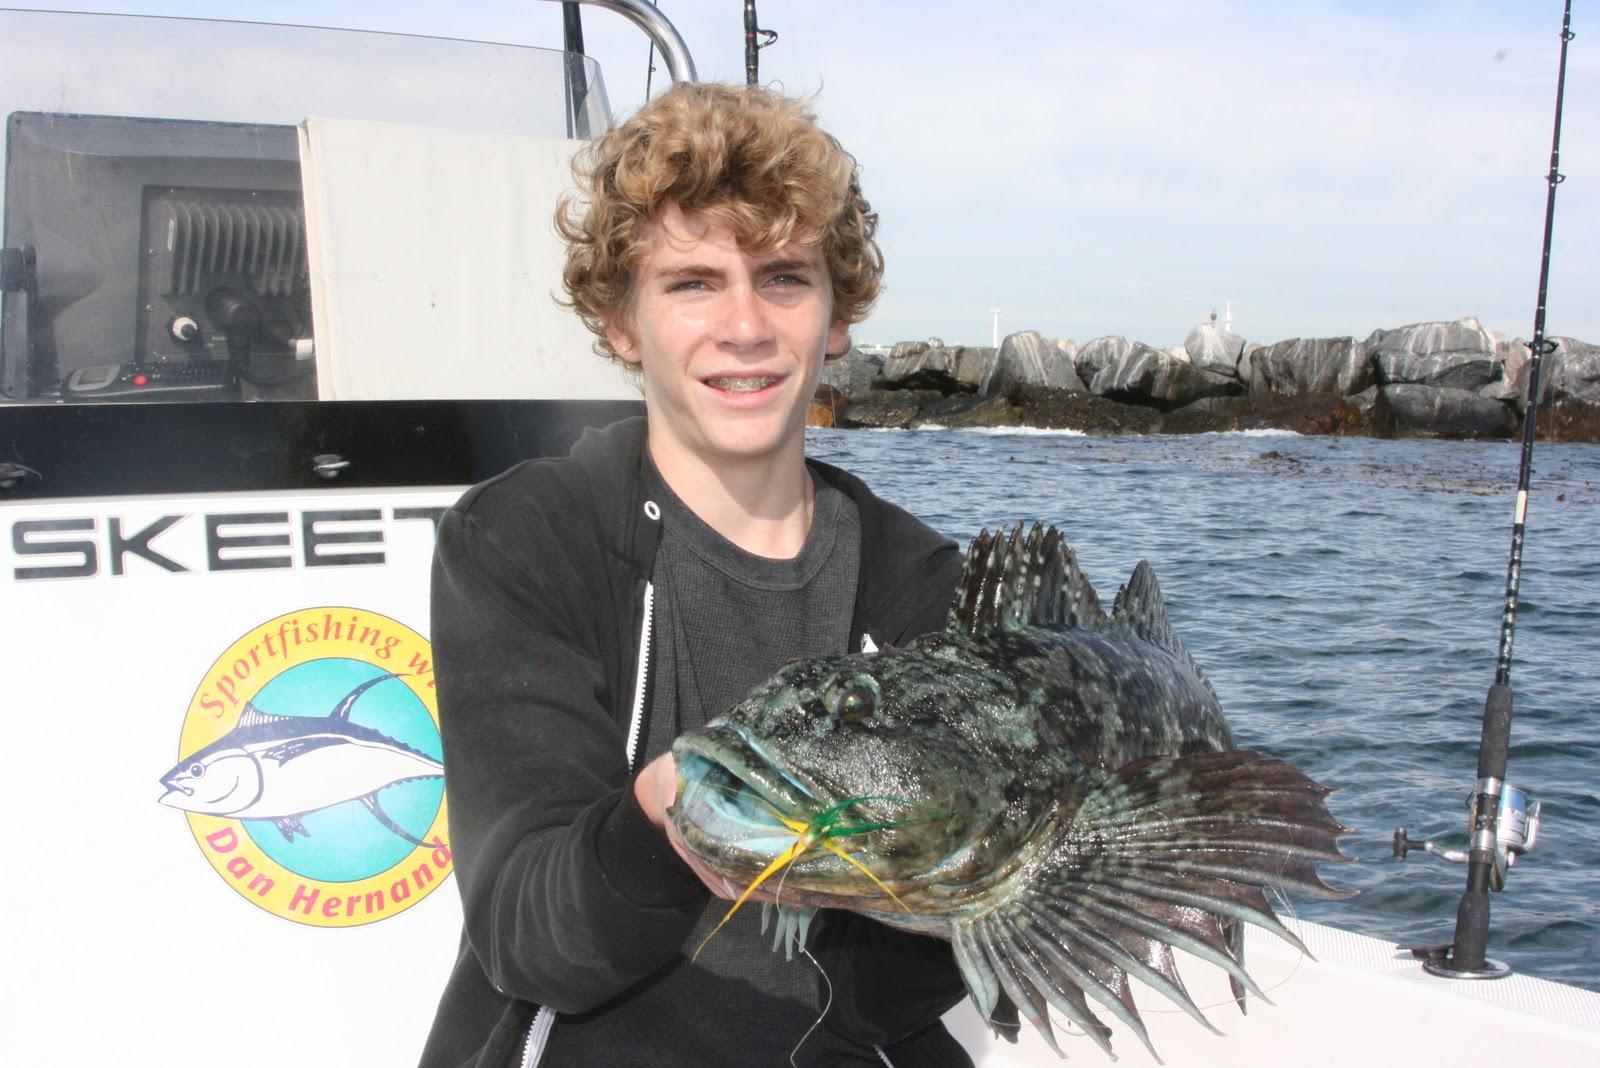 Dan 39 S Journal Long Beach Fishing Report